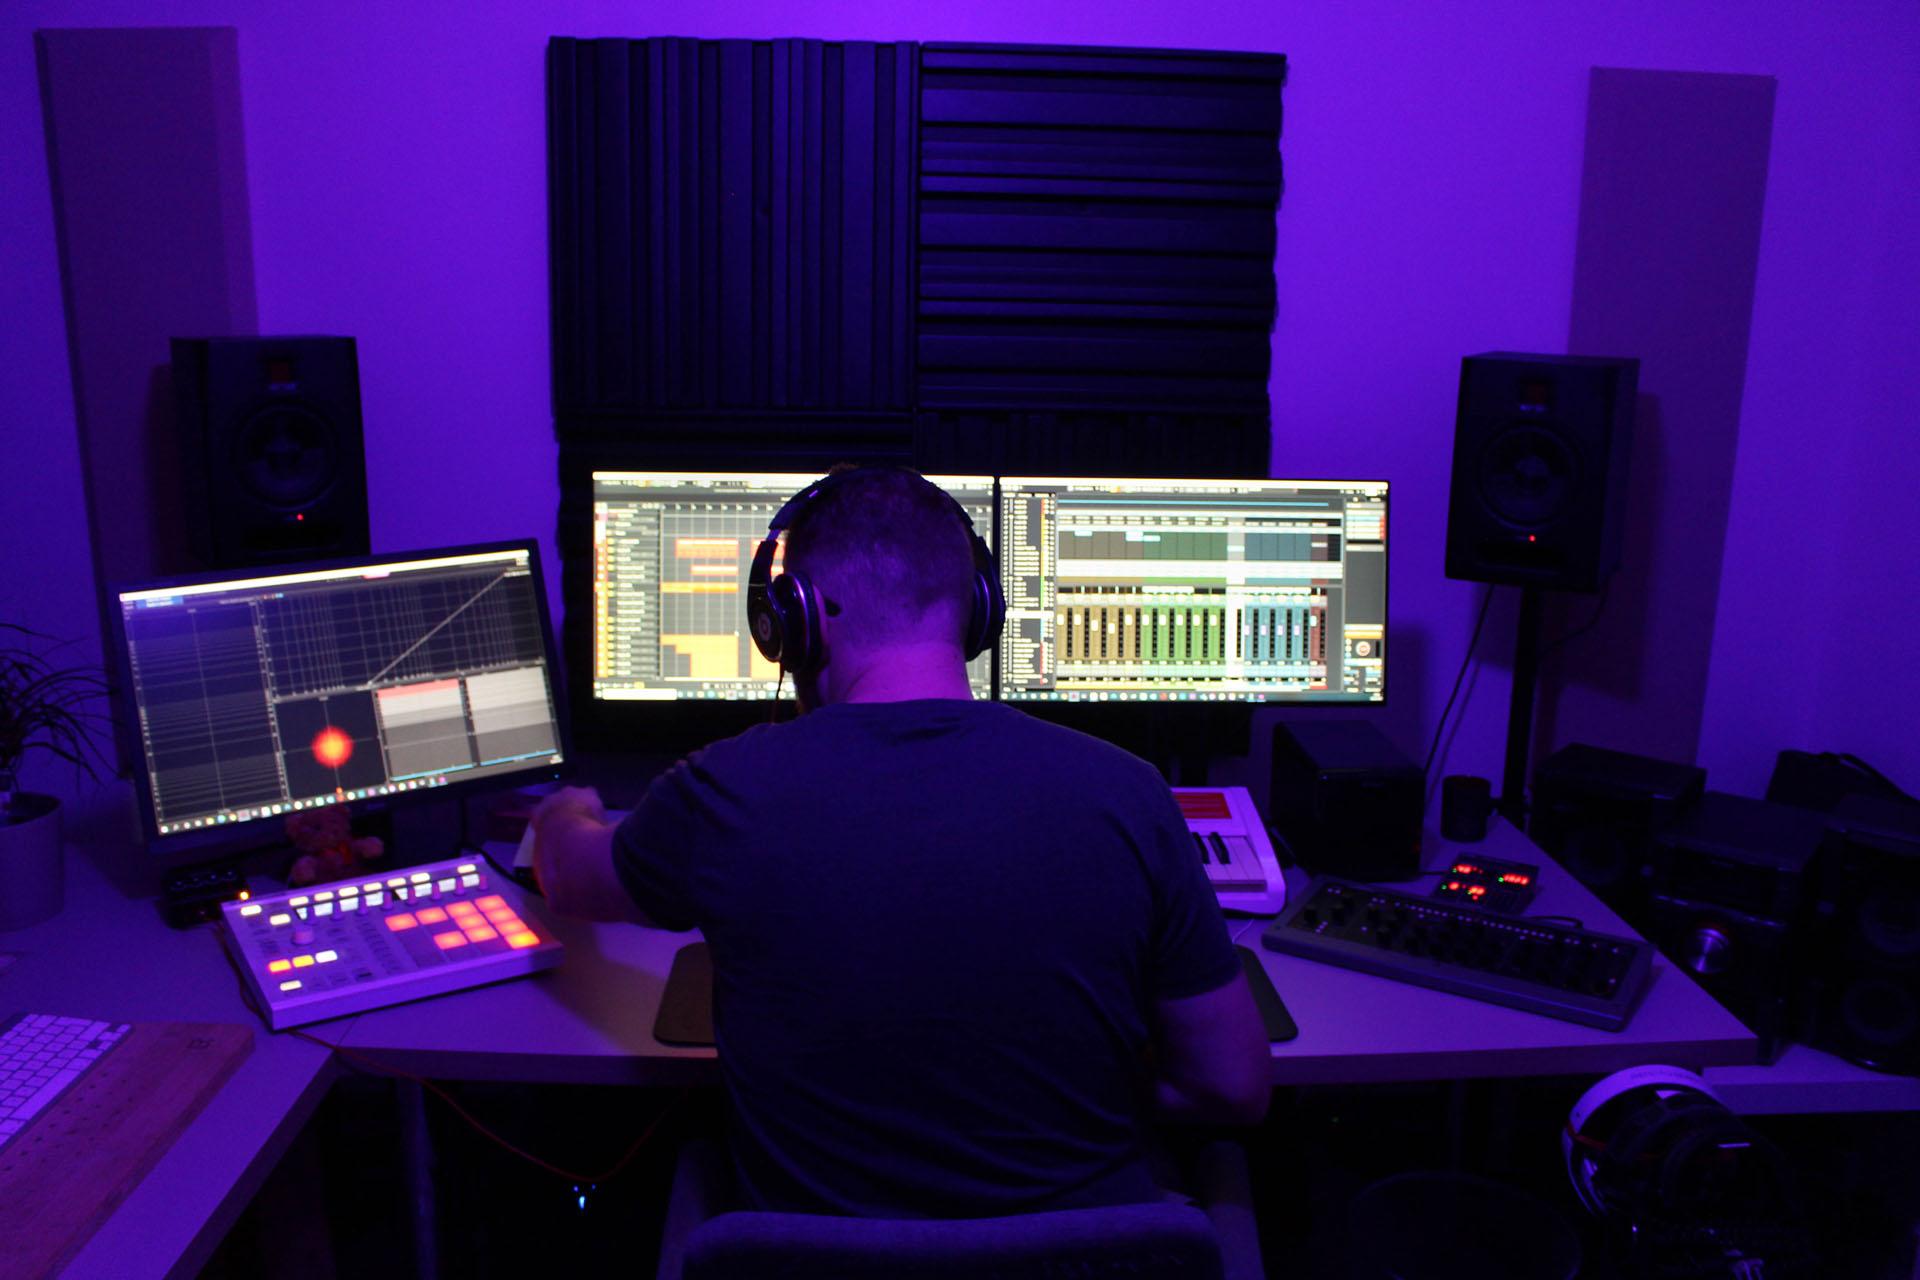 Photo de Kévin Waks dans son studio